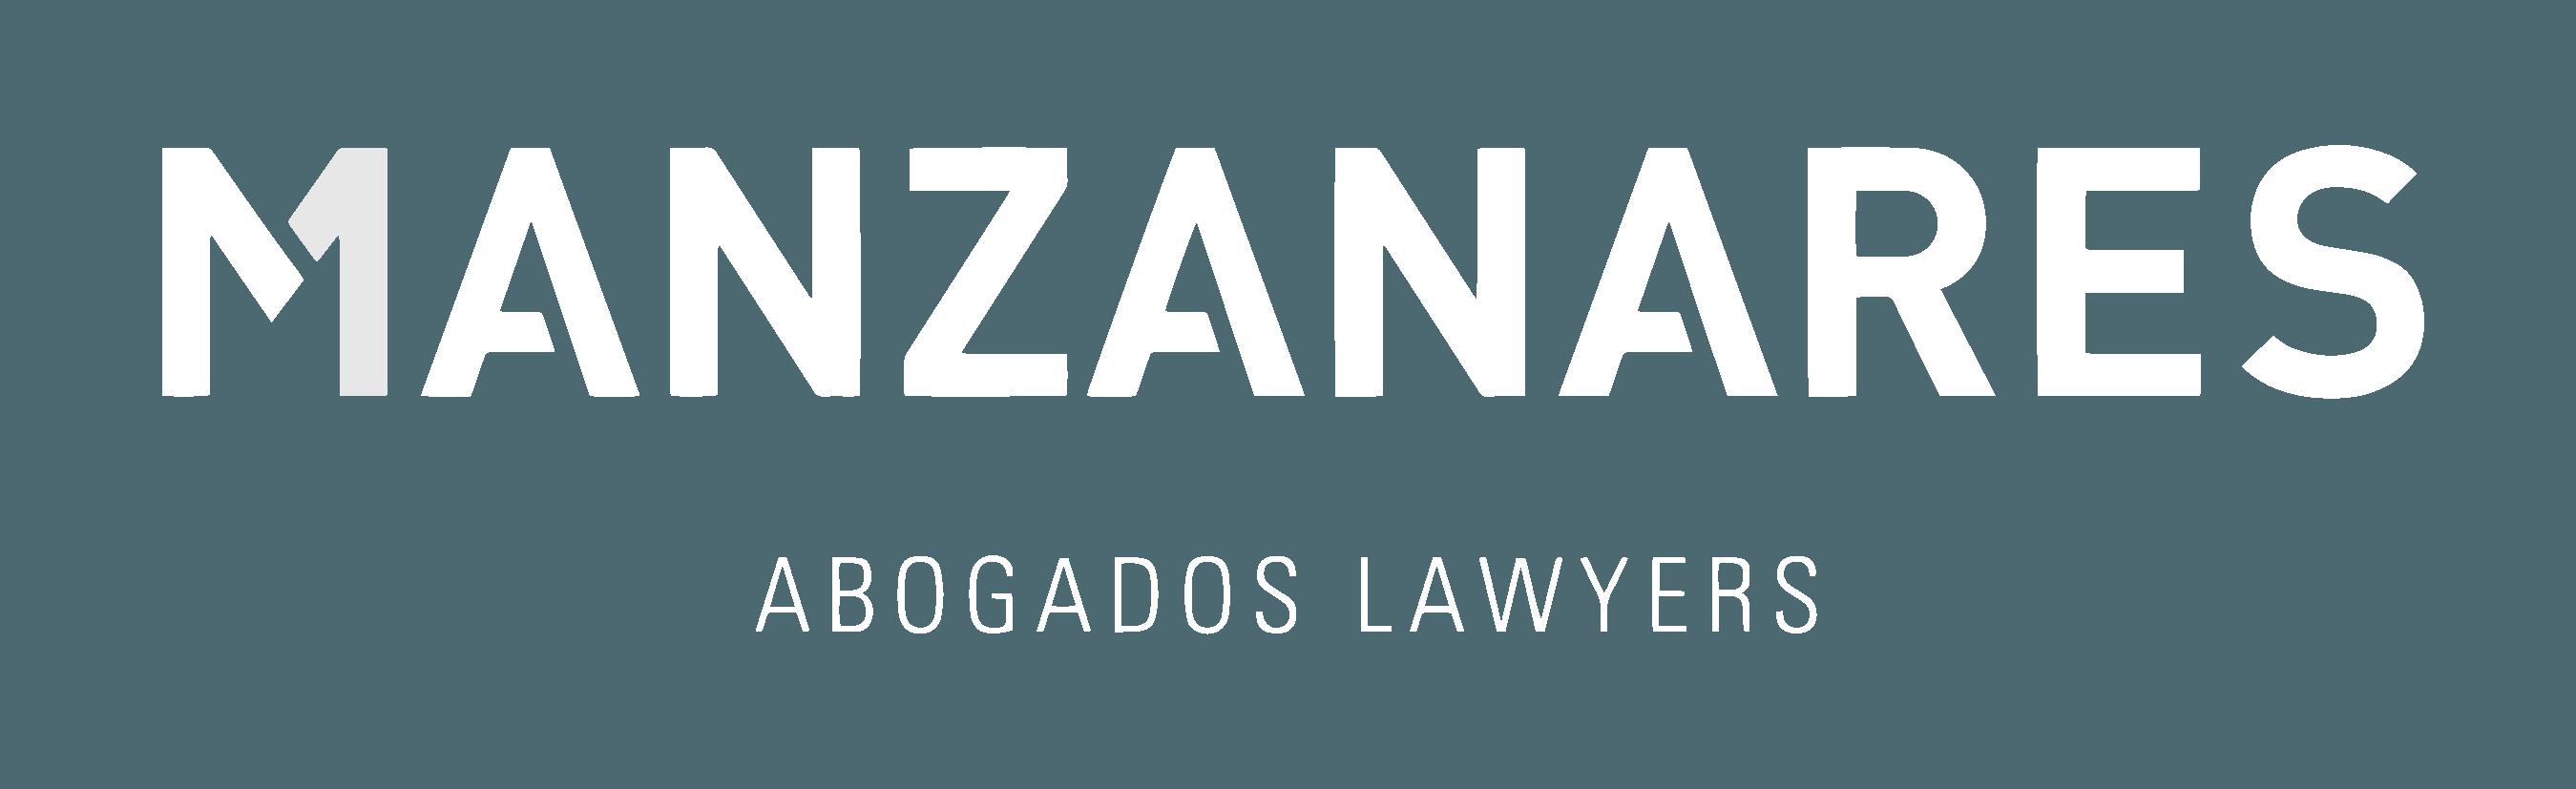 Manzanares Lawyers